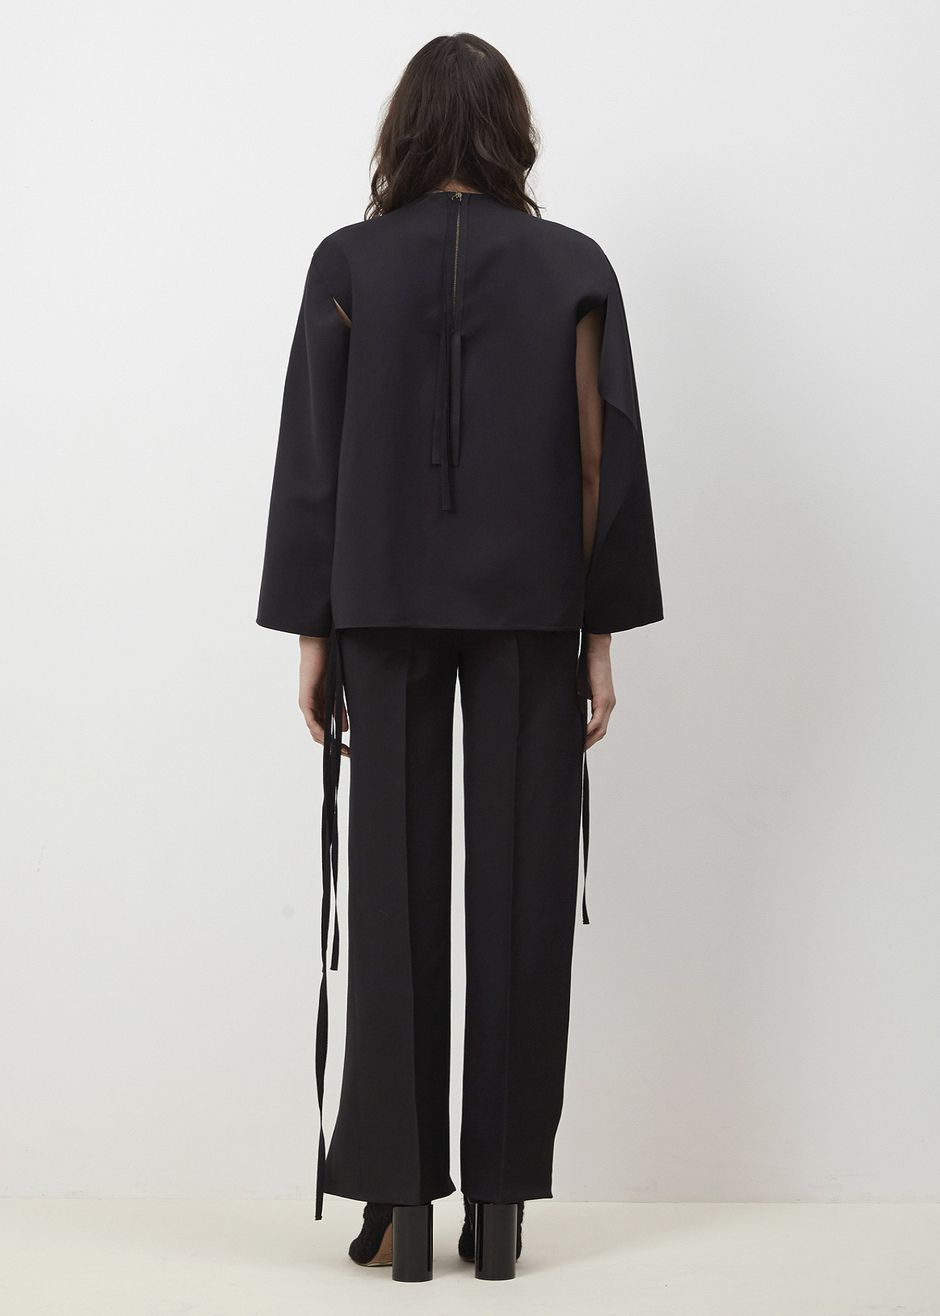 Ports 1961 Long Sleeve Shirt (Black)